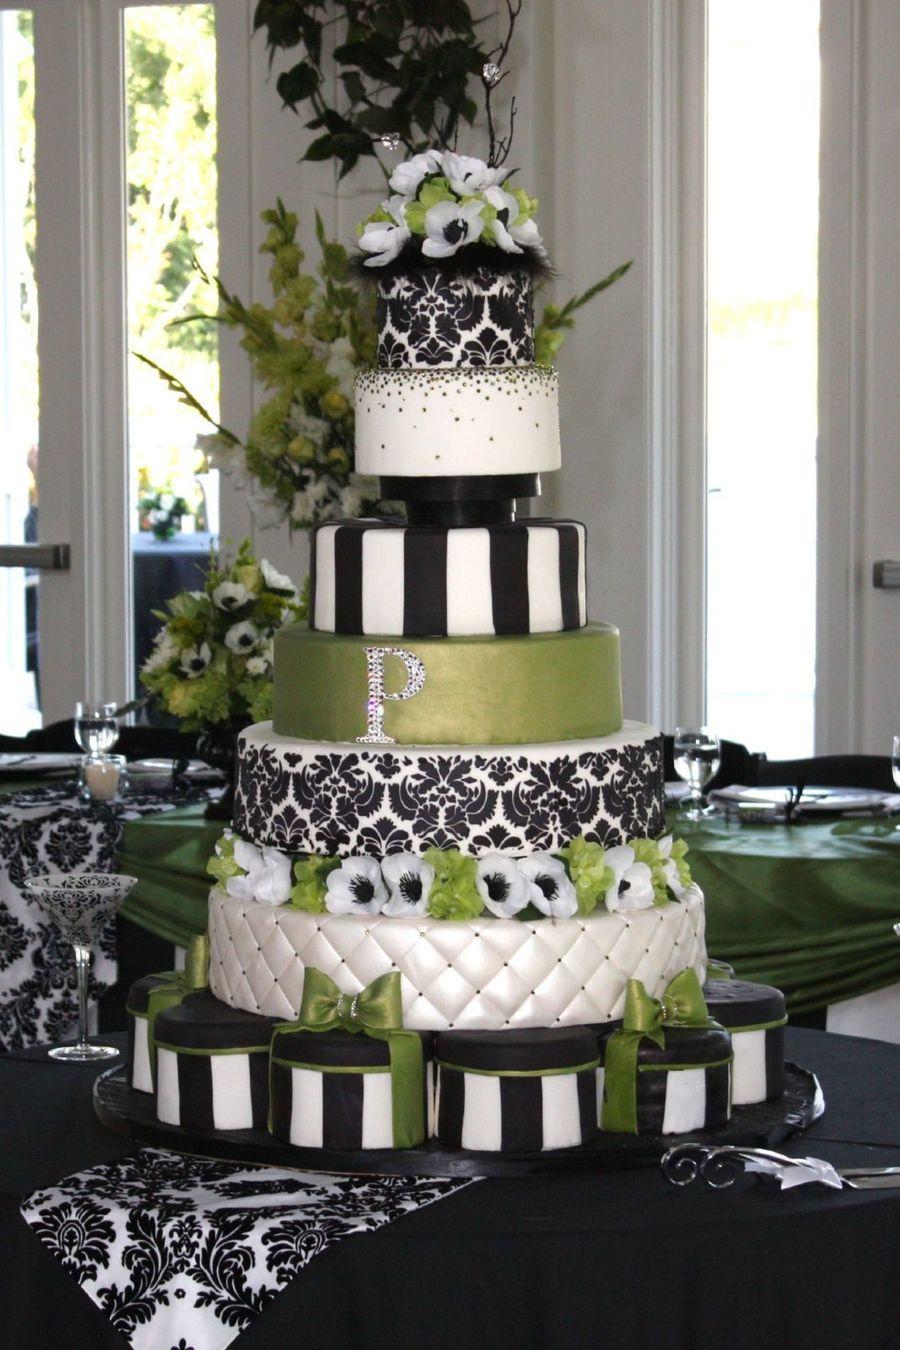 Green and Black Wedding Cake